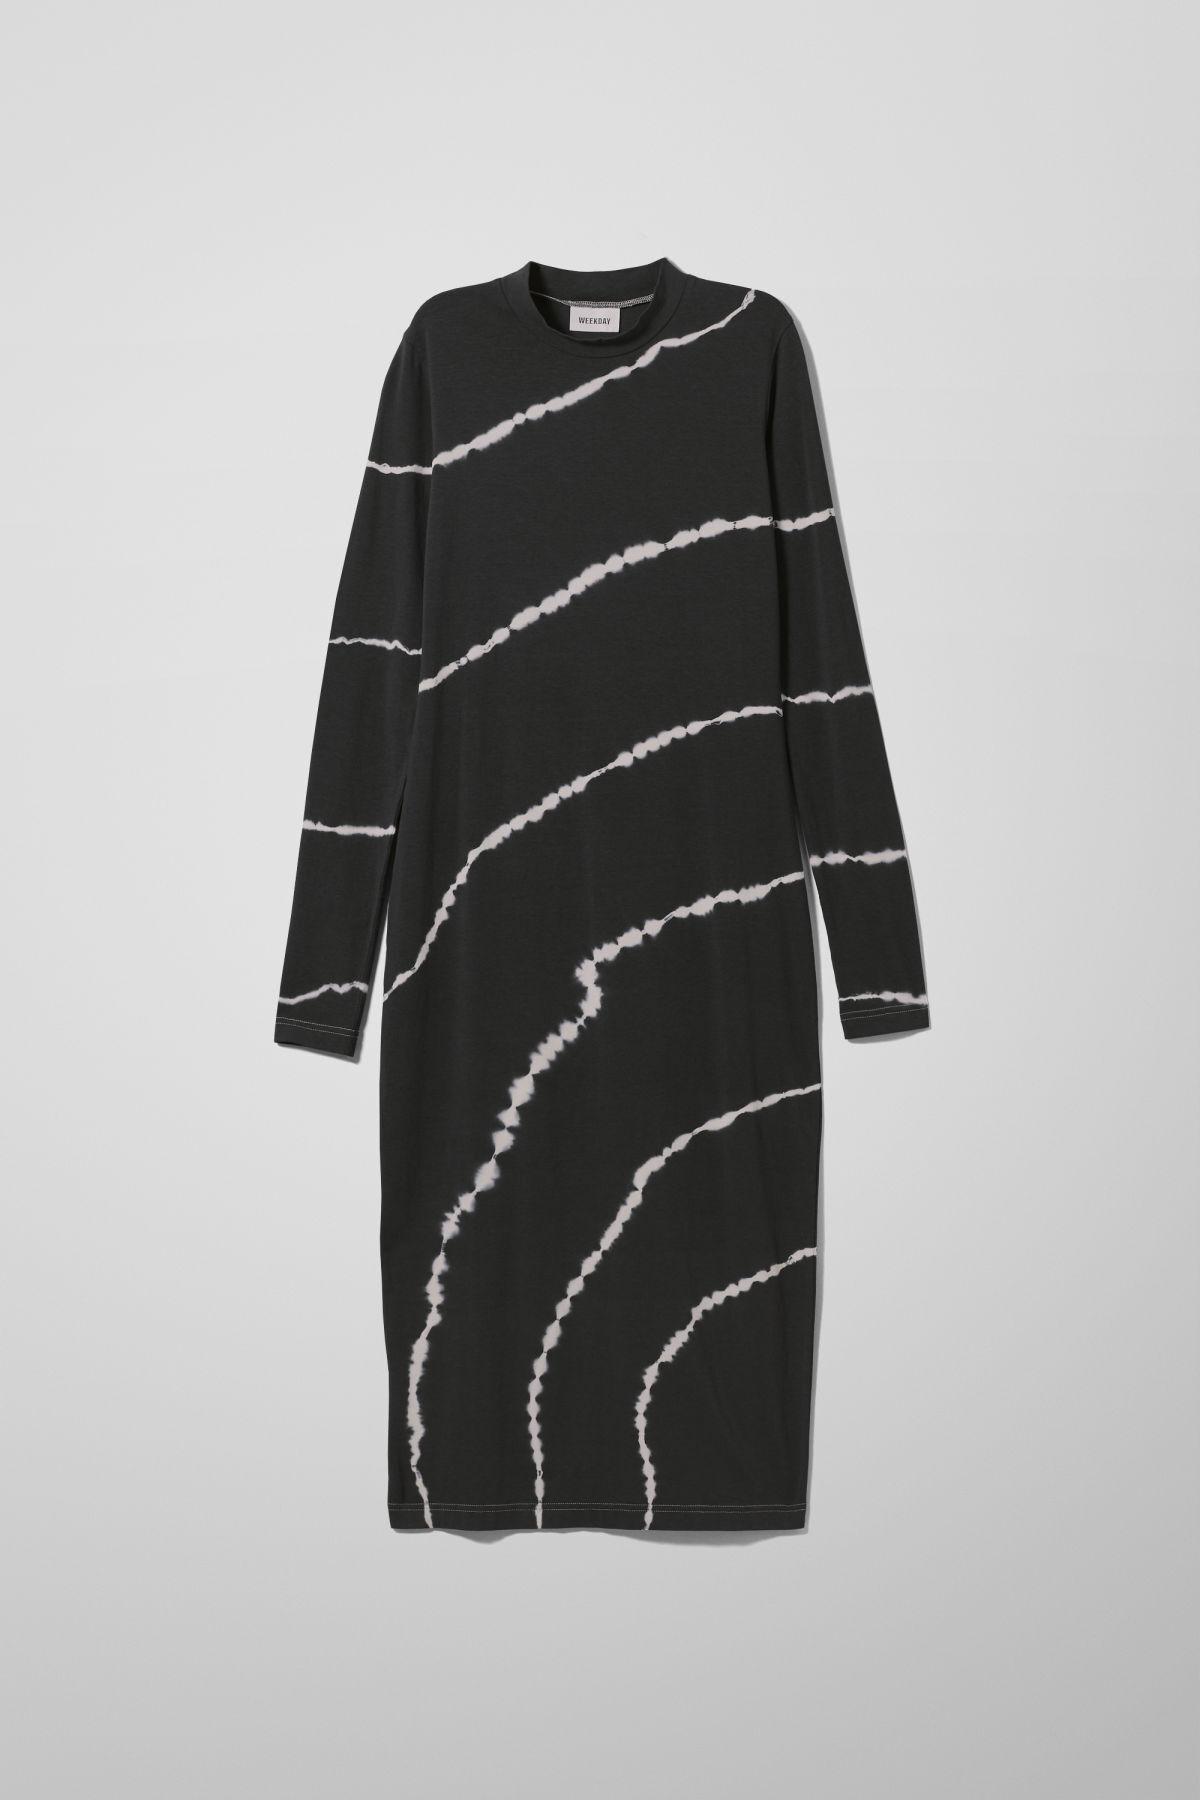 Image of Meja Dress - Black-XS